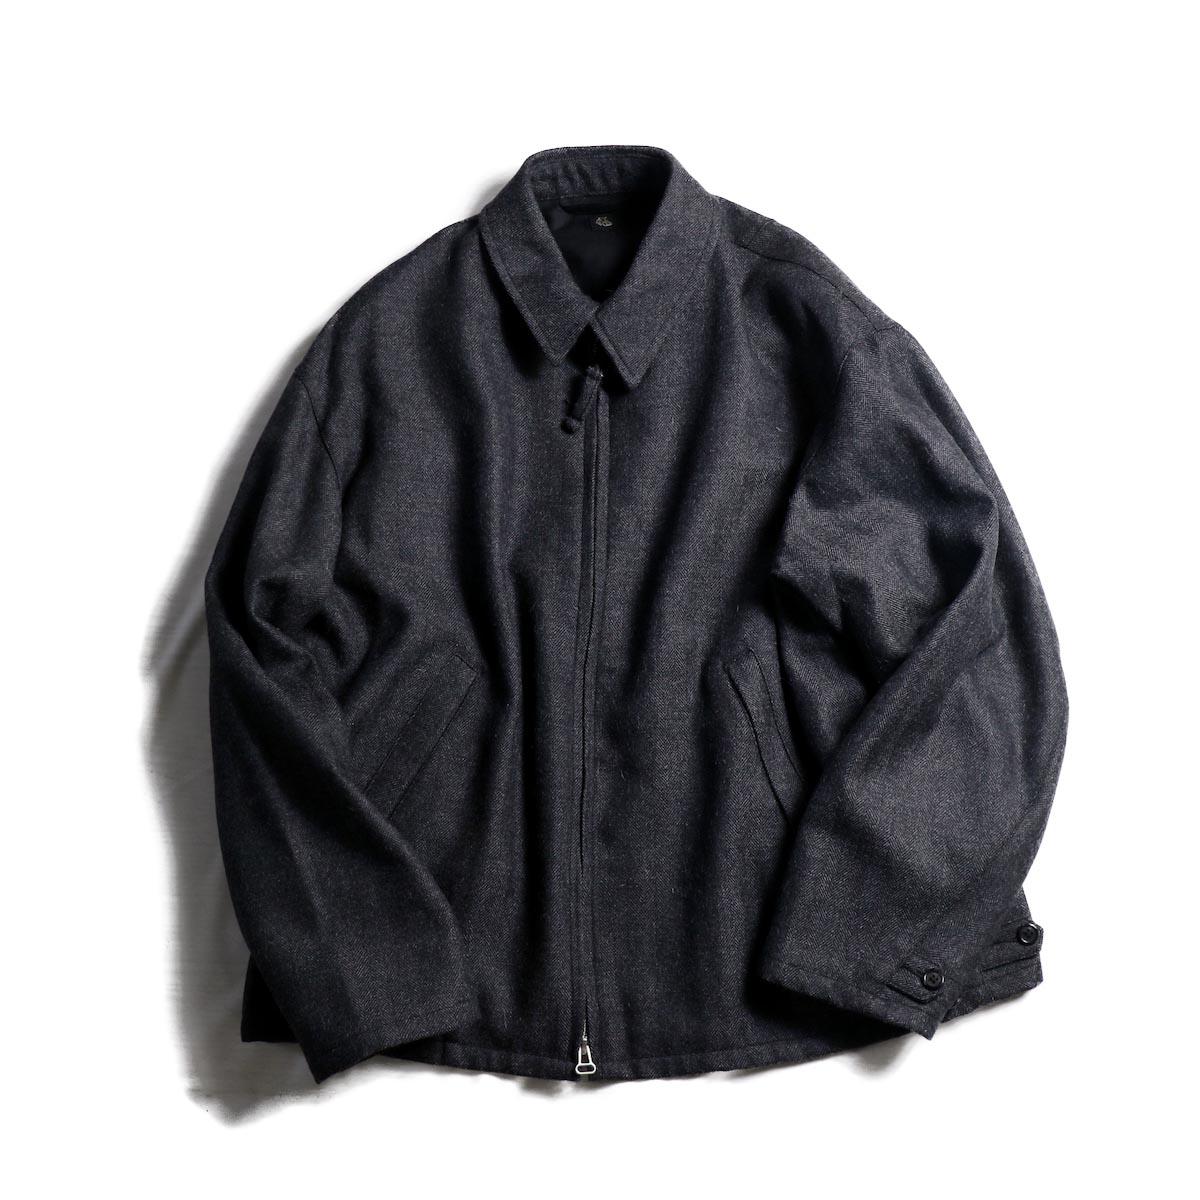 Kaptain Sunshine / Drizzler Jacket -Grey Herringbone